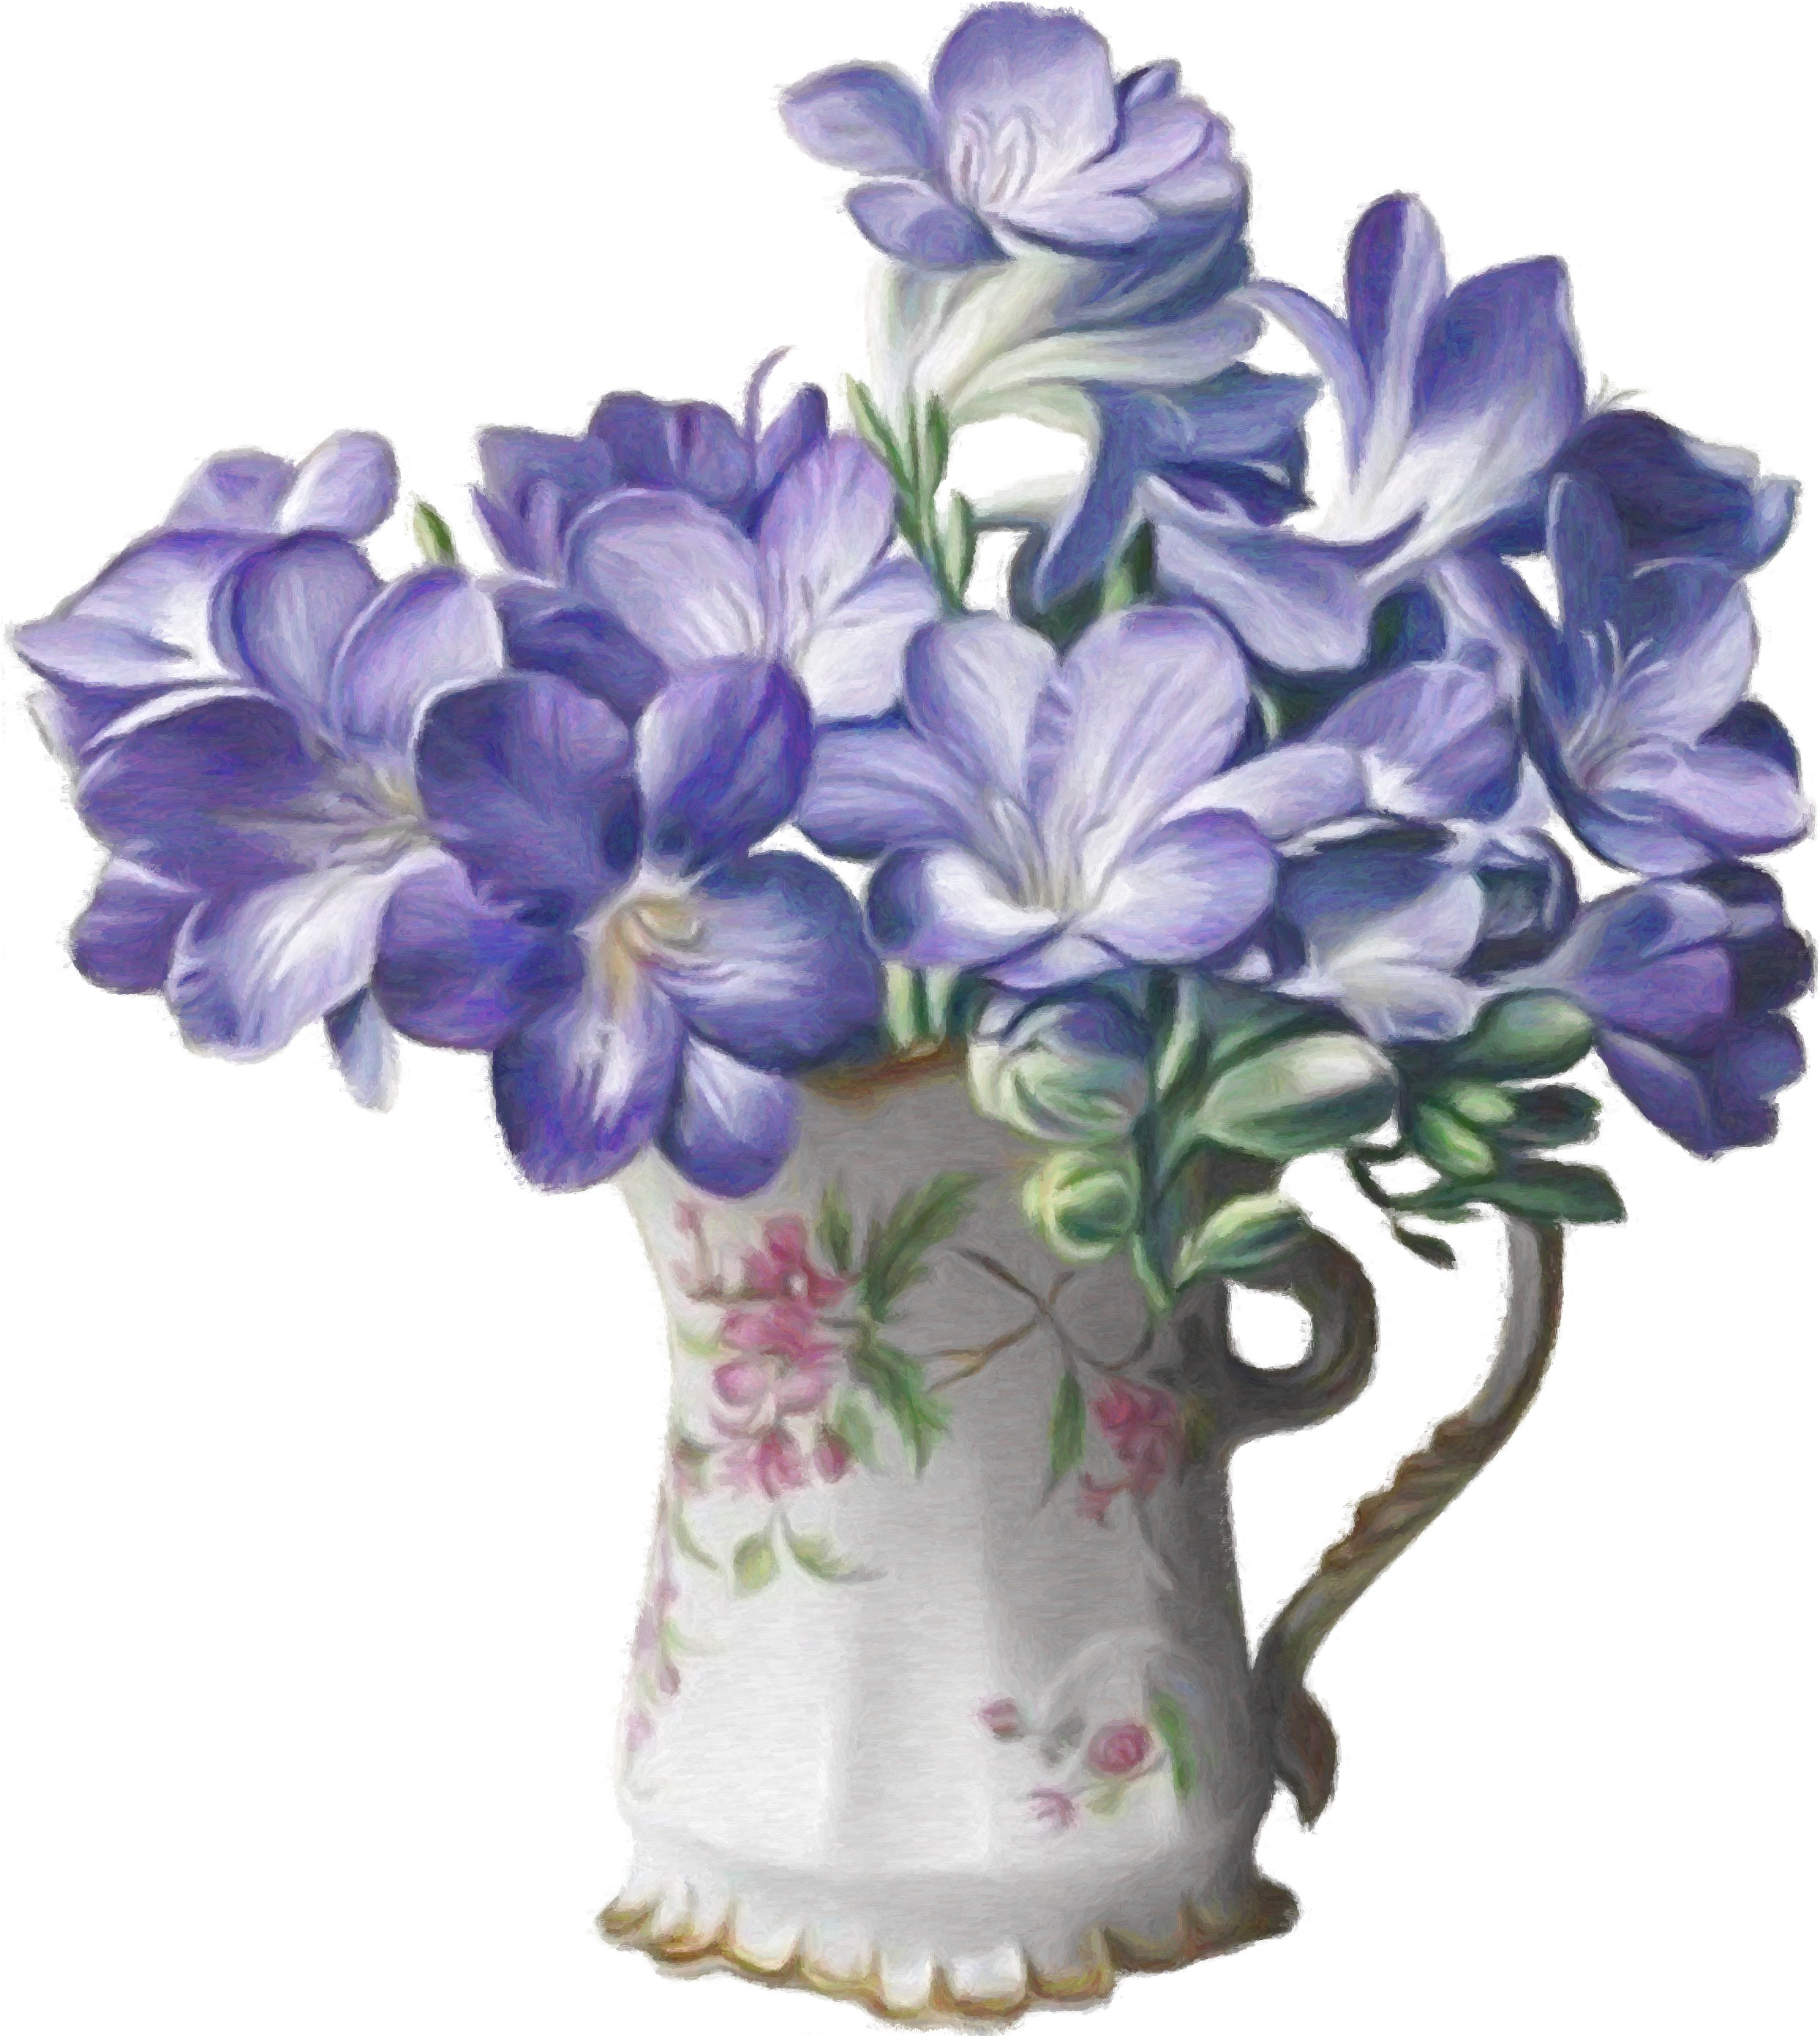 Подсолнухи в вазе рисунок